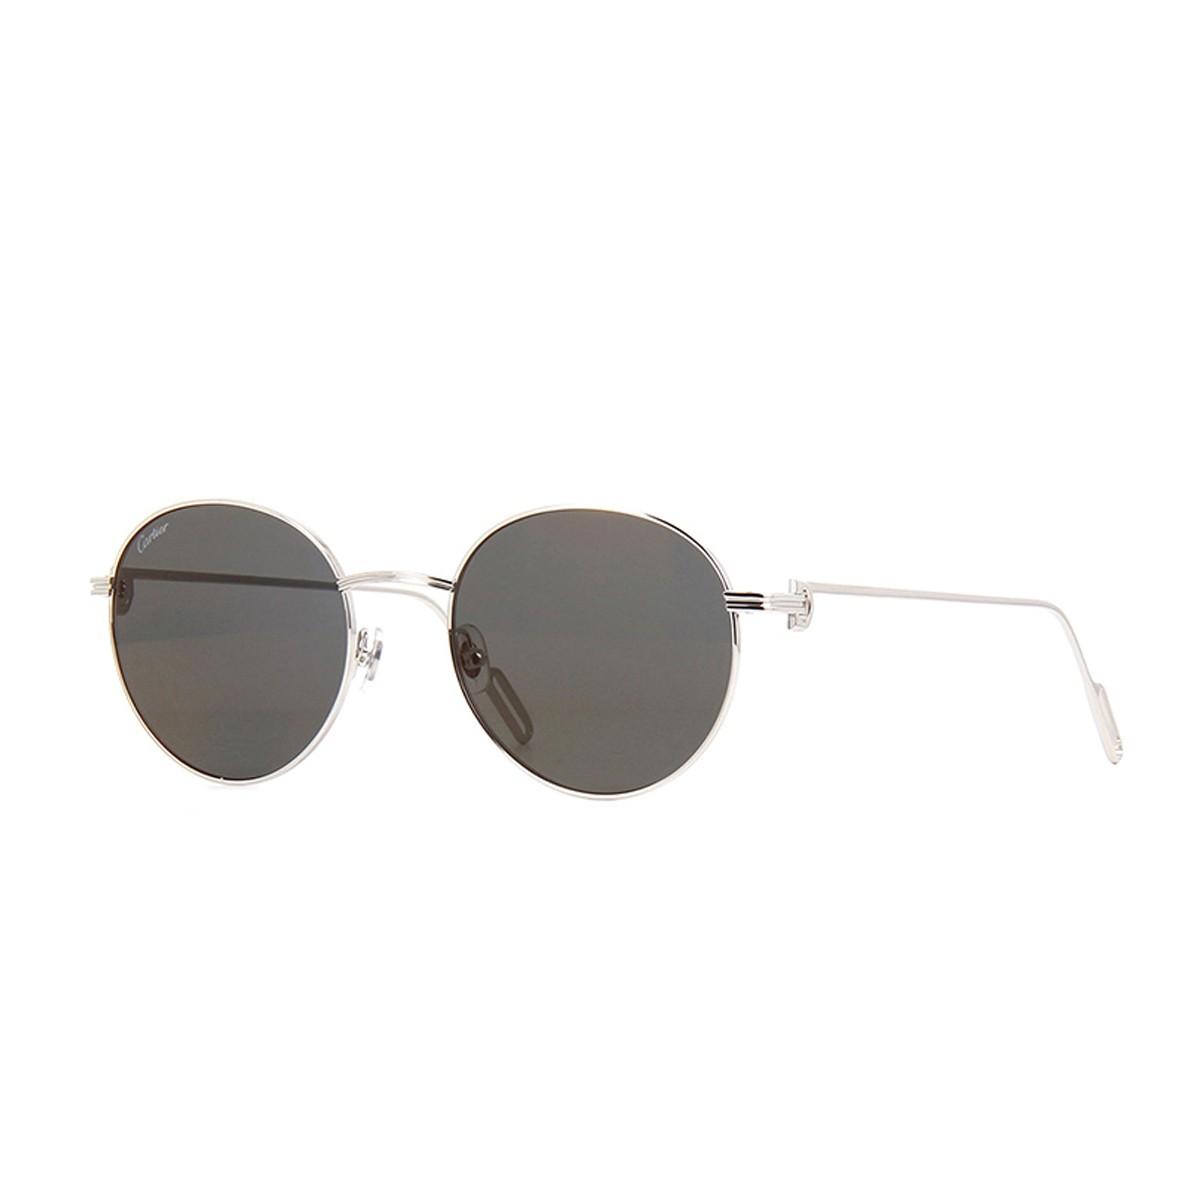 Cartier CT0249S   Unisex sunglasses